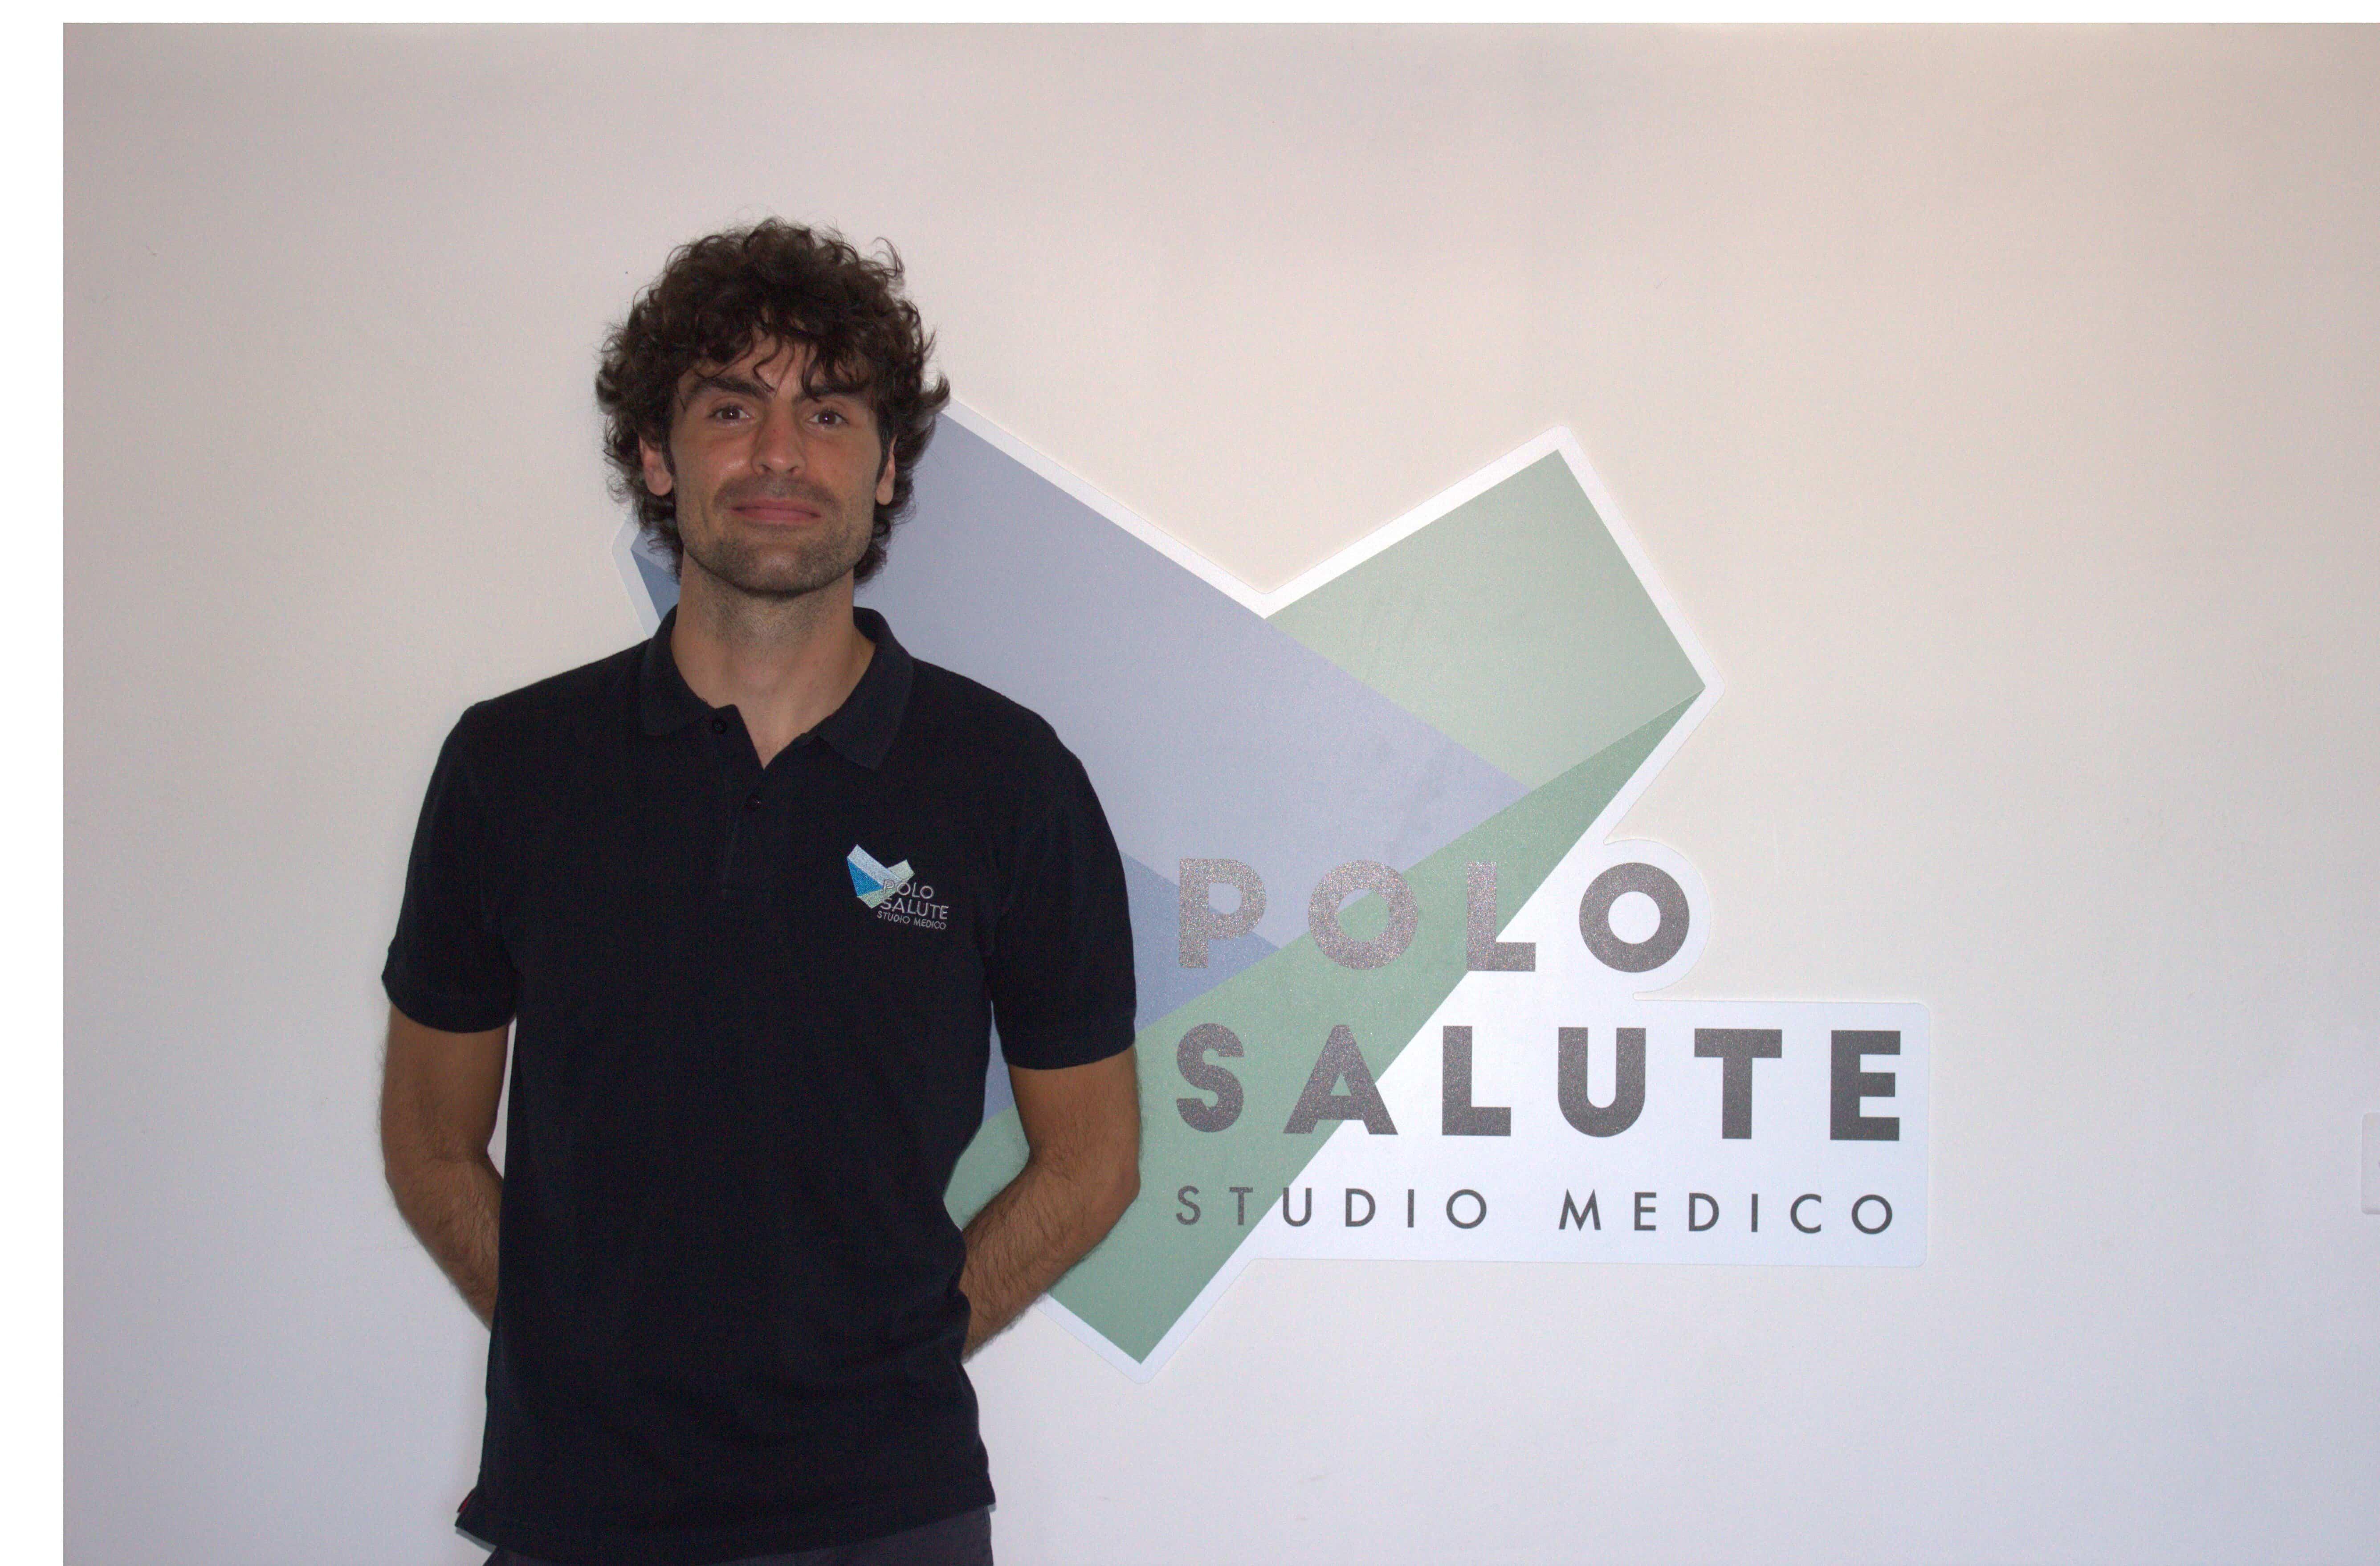 Enrico Chioetto Massofisioterapista Polo Salute Studio Medico A Verona